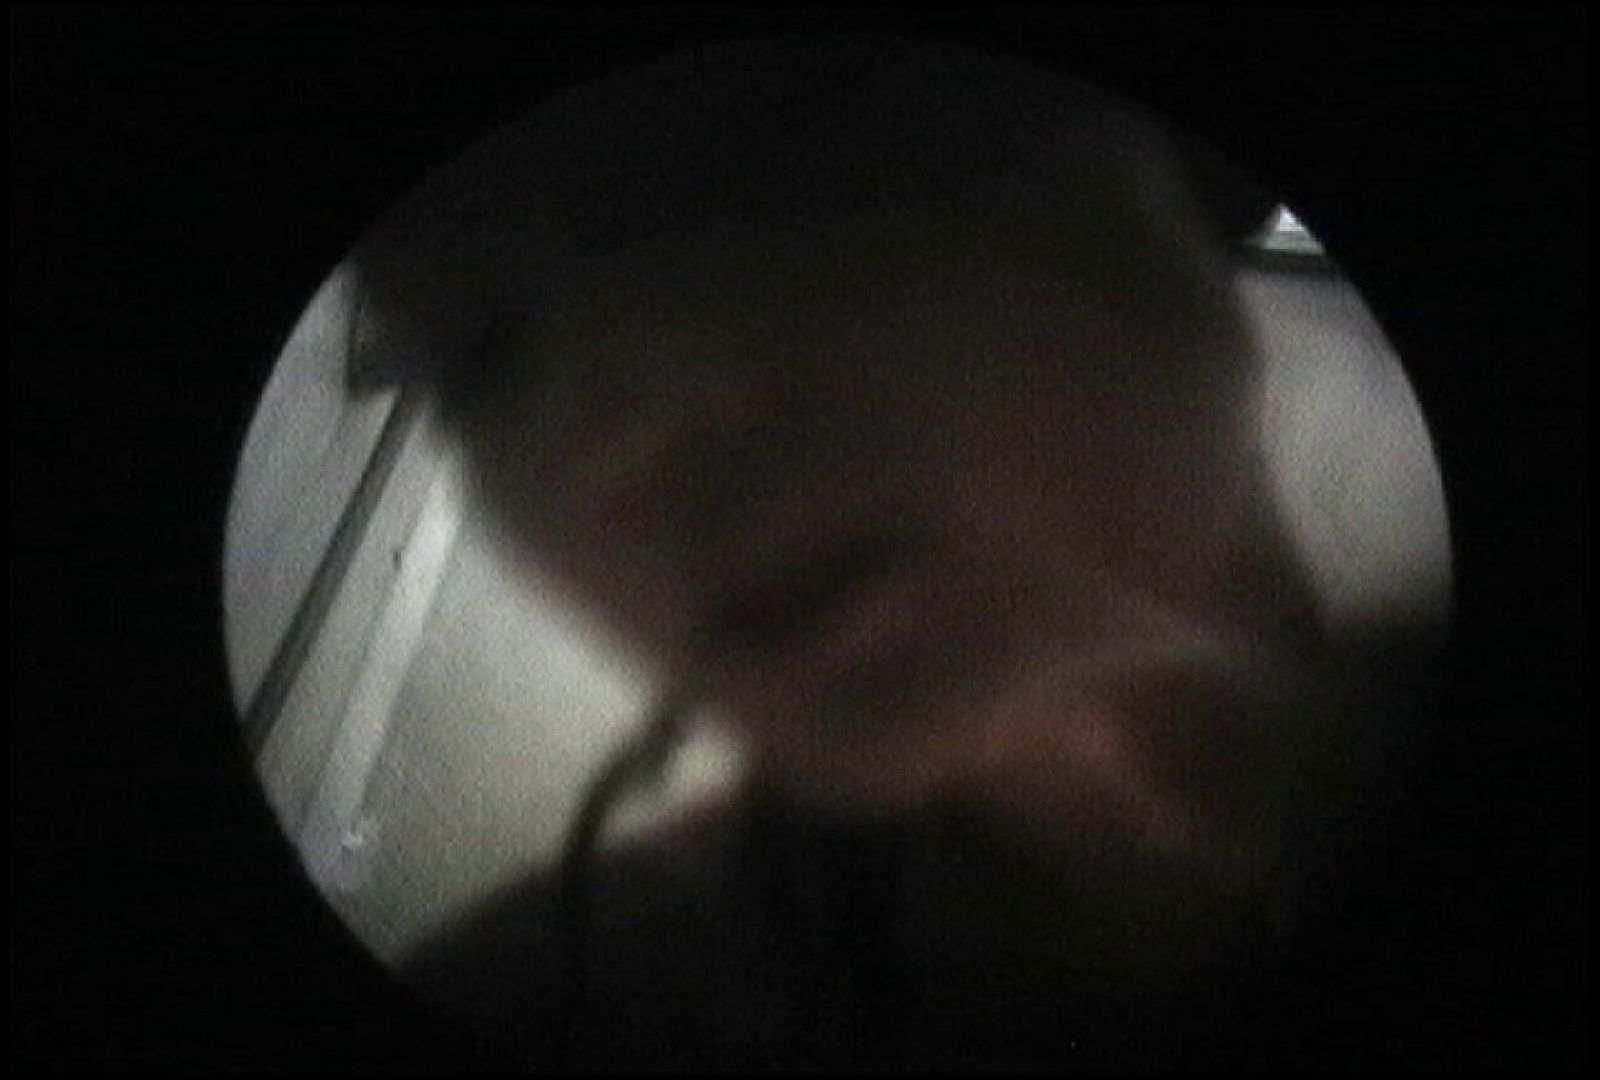 No.139 見上げる美乳 少し暗いのが残念! シャワー エロ画像 67画像 12